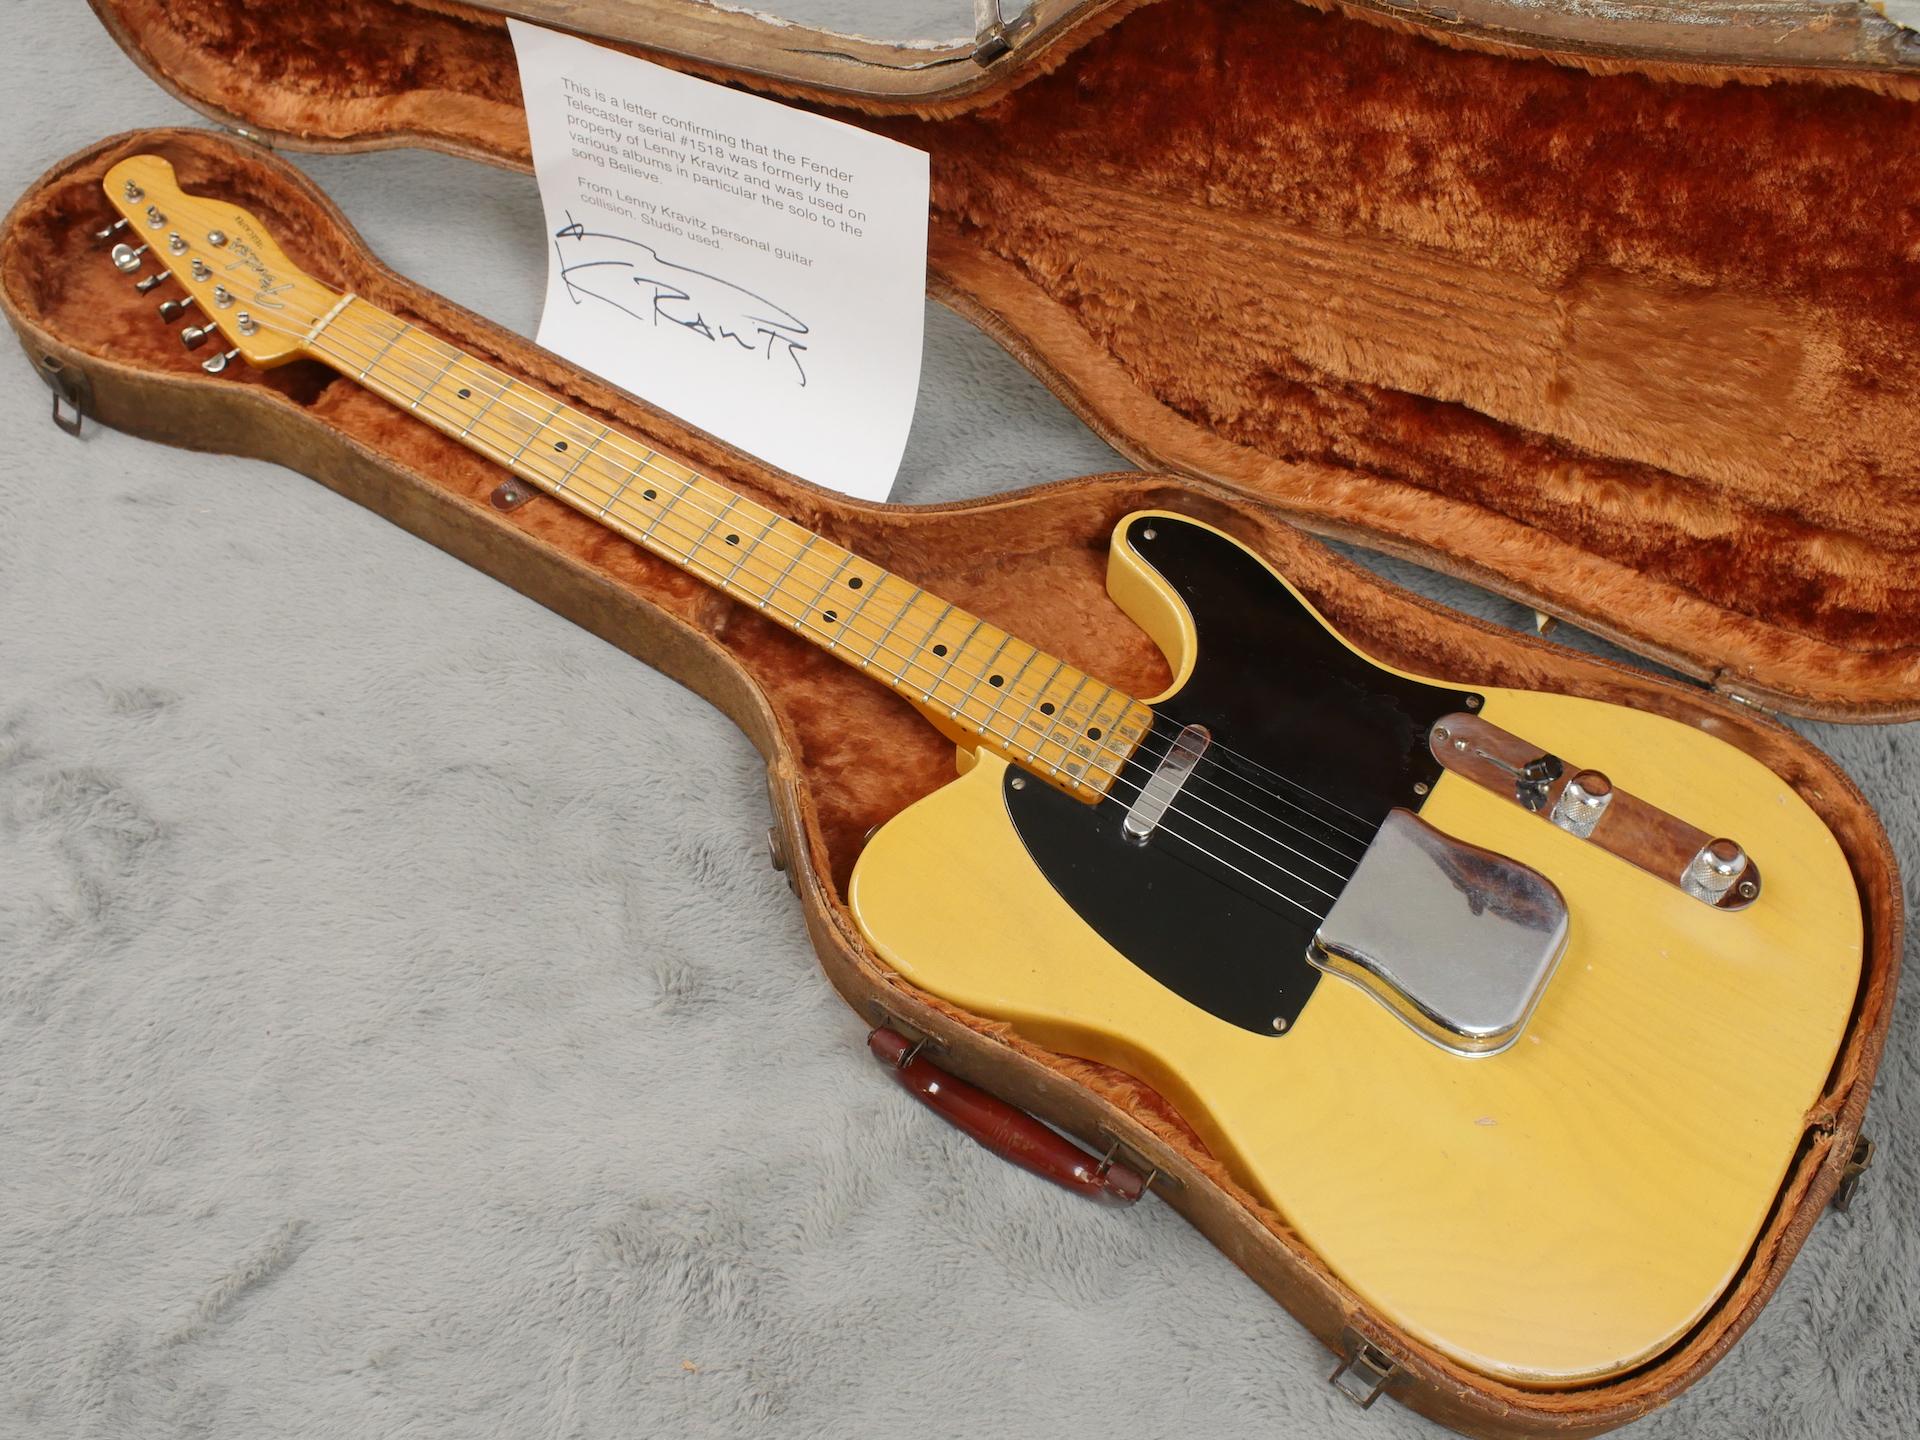 Product - ATB Guitars Ltd